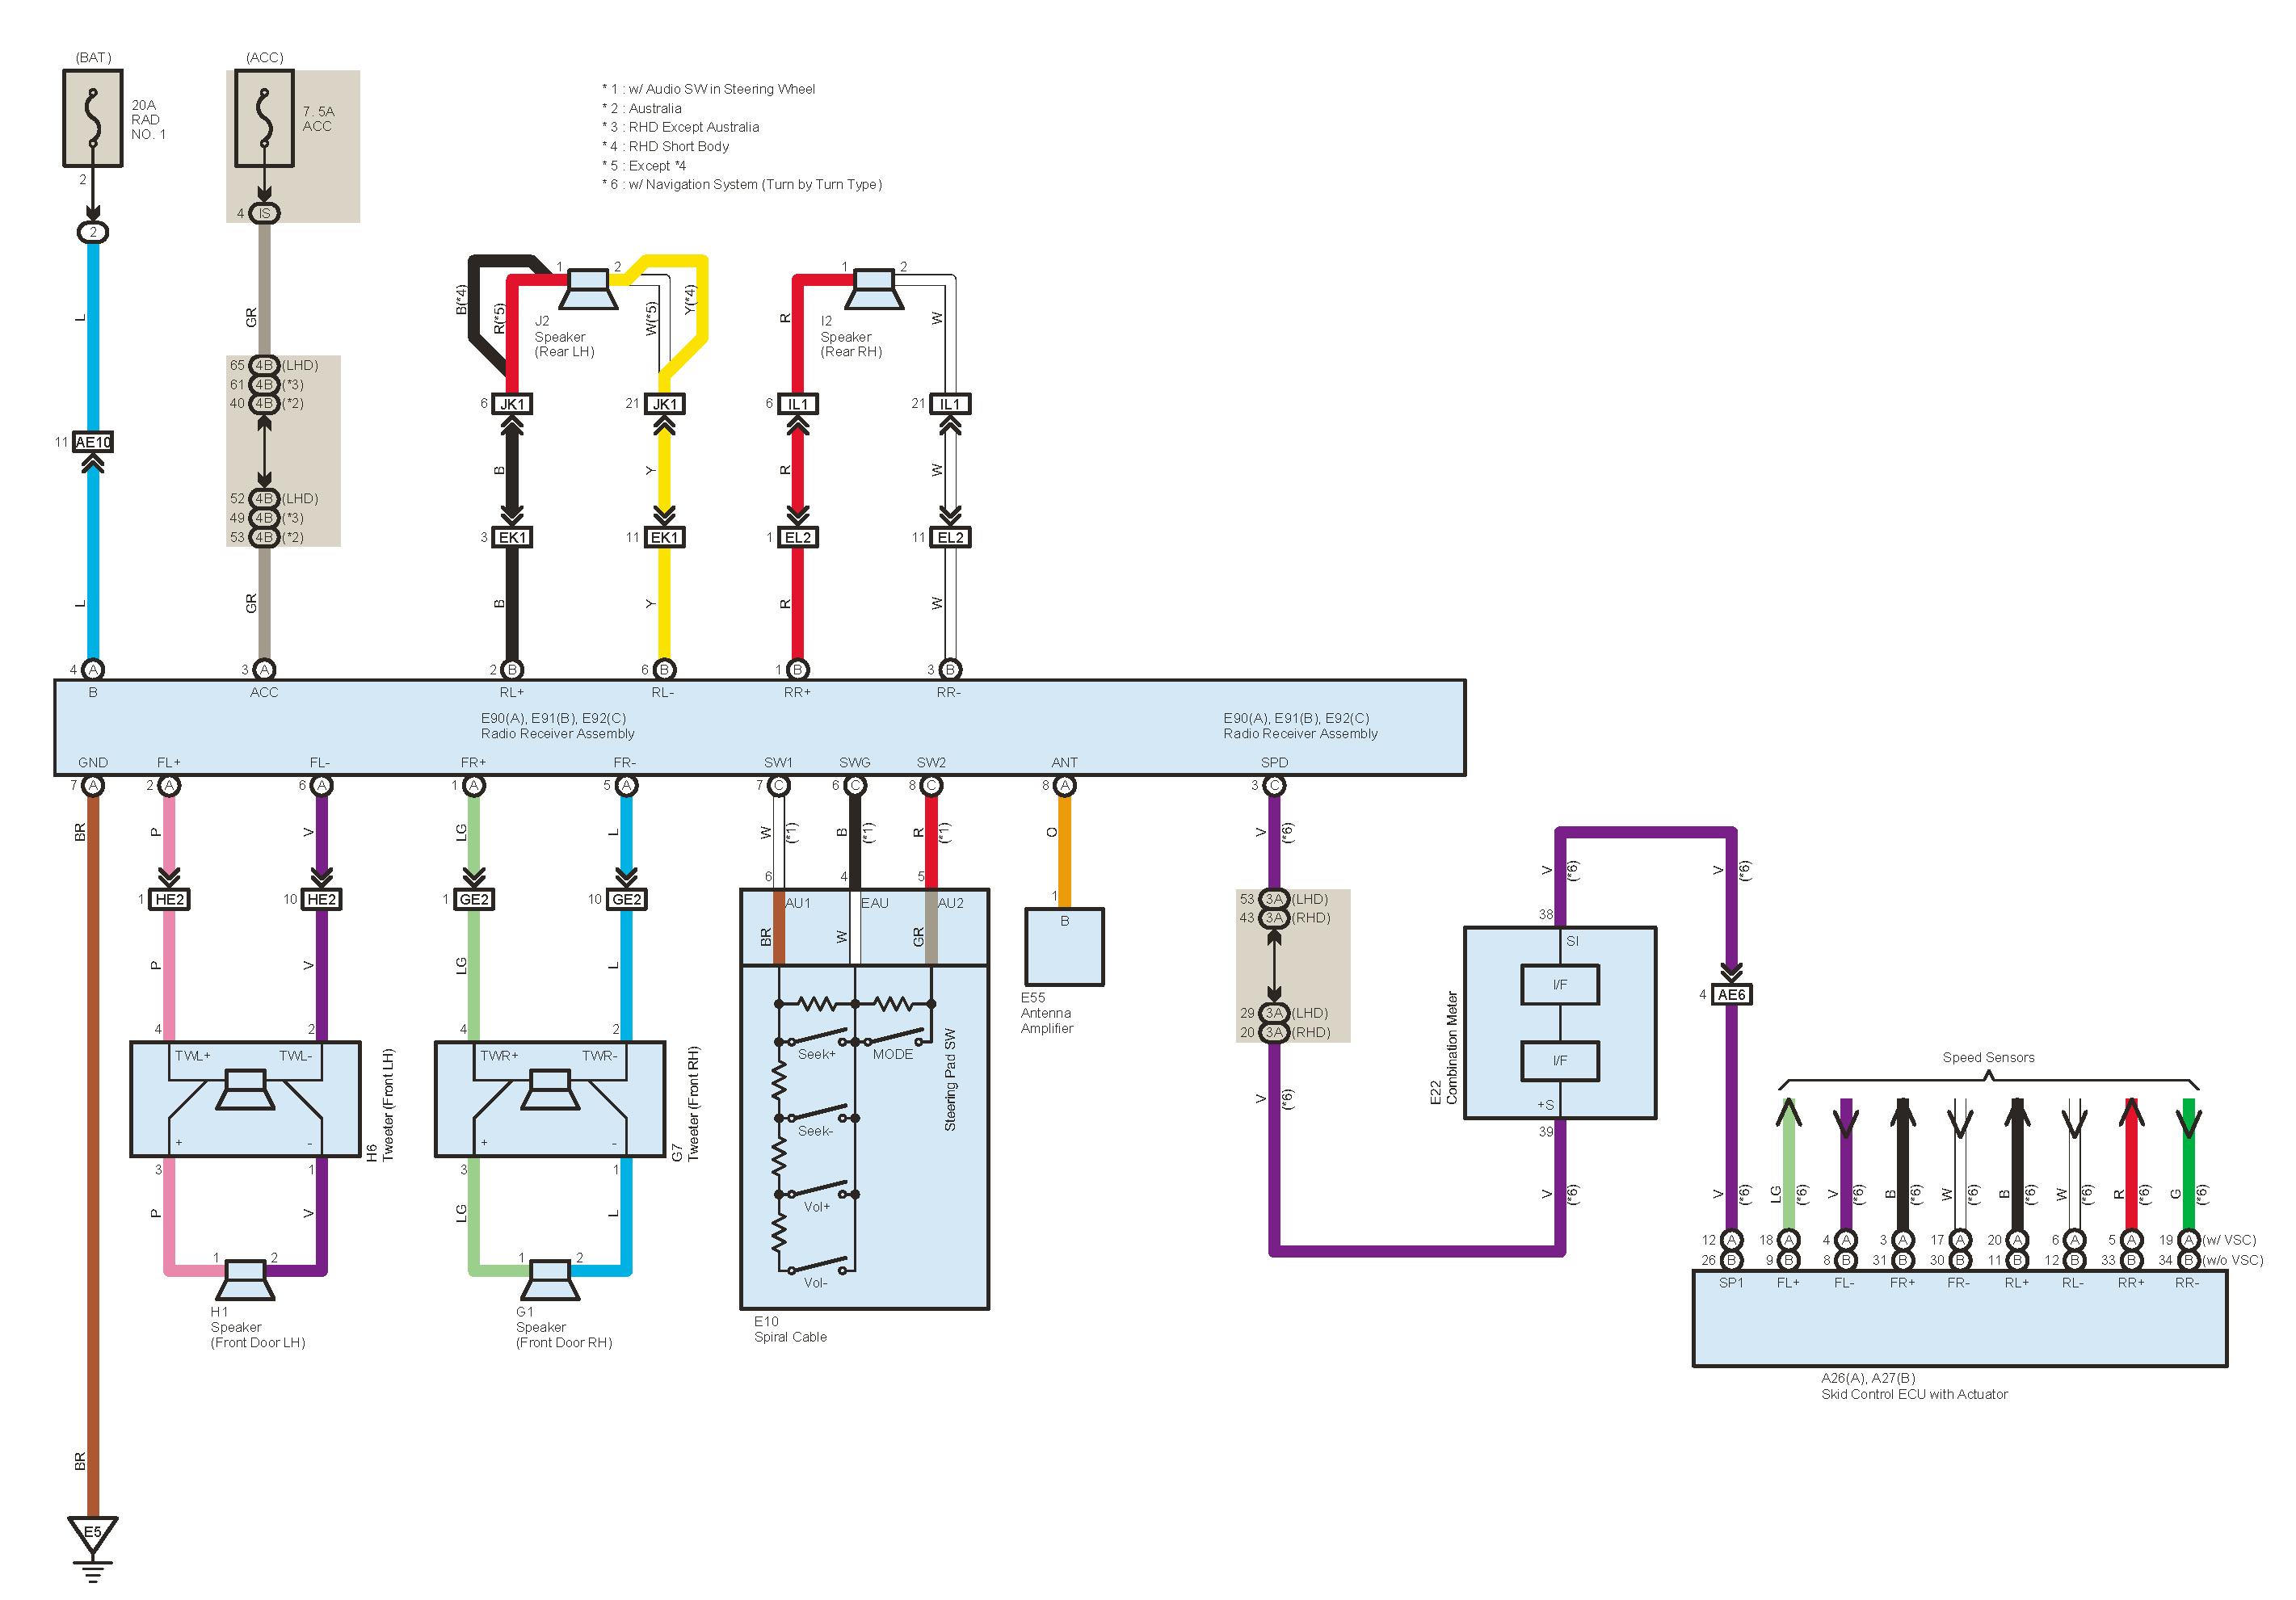 Diagram Suzuki Sx4 Radio Wiring Diagram Full Version Hd Quality Wiring Diagram Stoneswiring2k Atuttasosta It